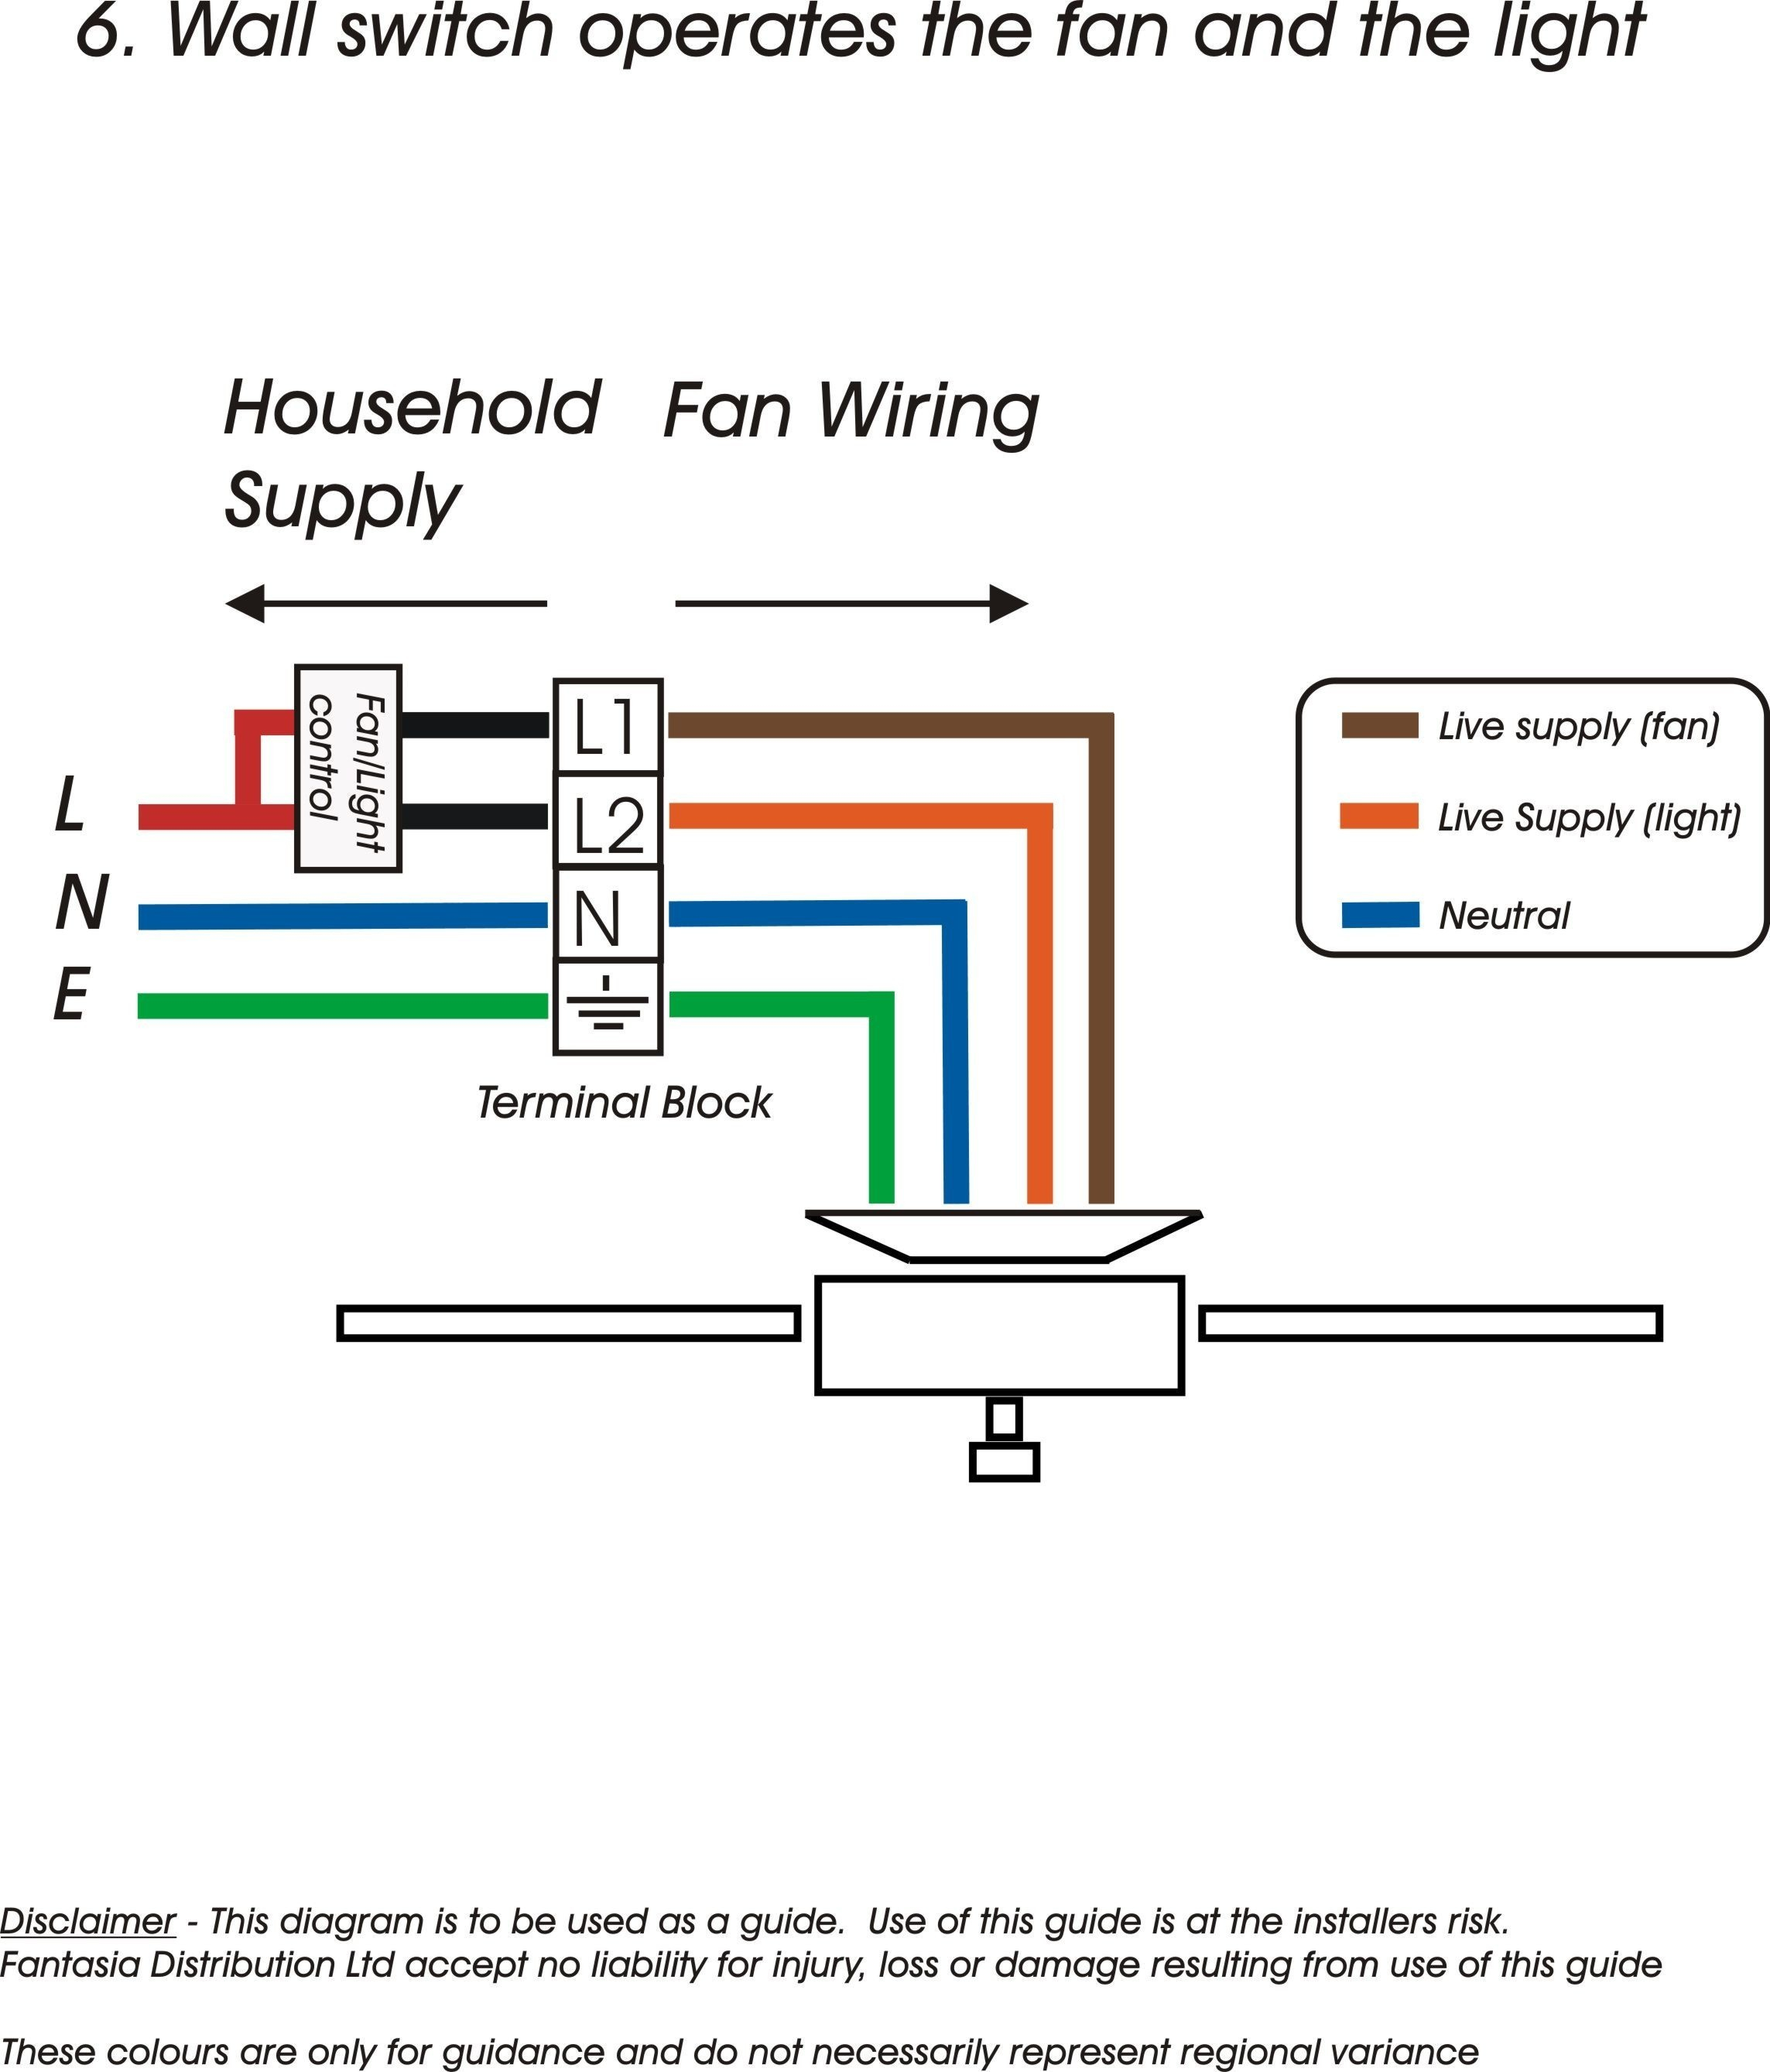 Extension Cord Wiring Diagram | Wiring Diagram - Extension Cord Wiring Diagram